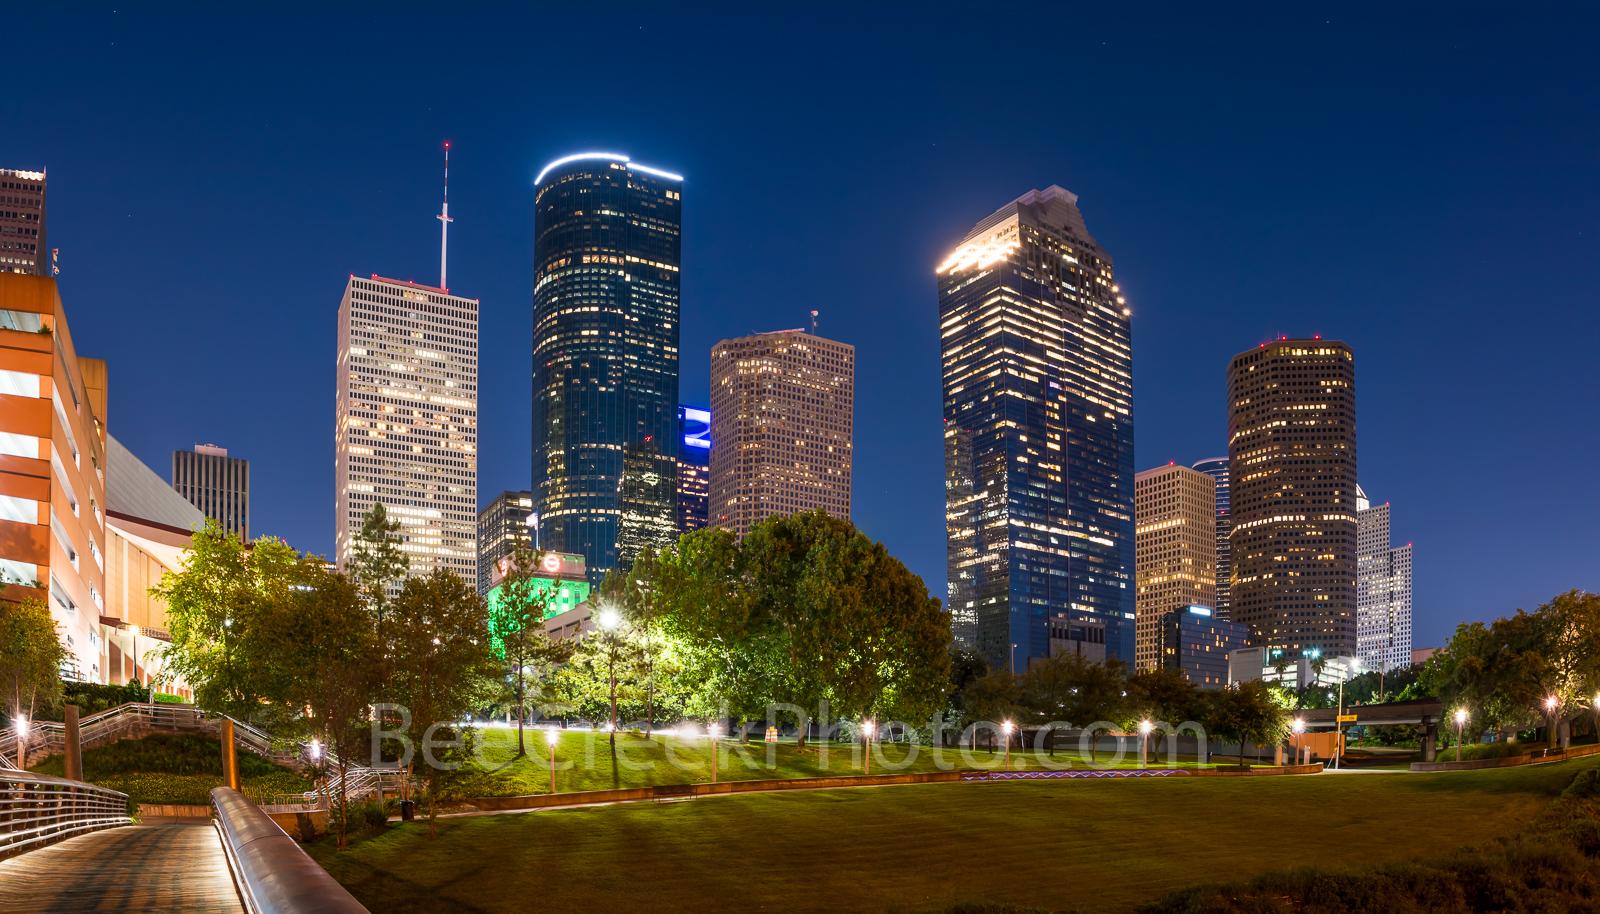 Houston, bagby to sabine, promenade, bridge, downtown, skyline, twilight, blue hour, dusk, pedestrian bridges, america, cityscapes, buffalo bayou, water, reflections, stock bridge photos, stock bridge, photo